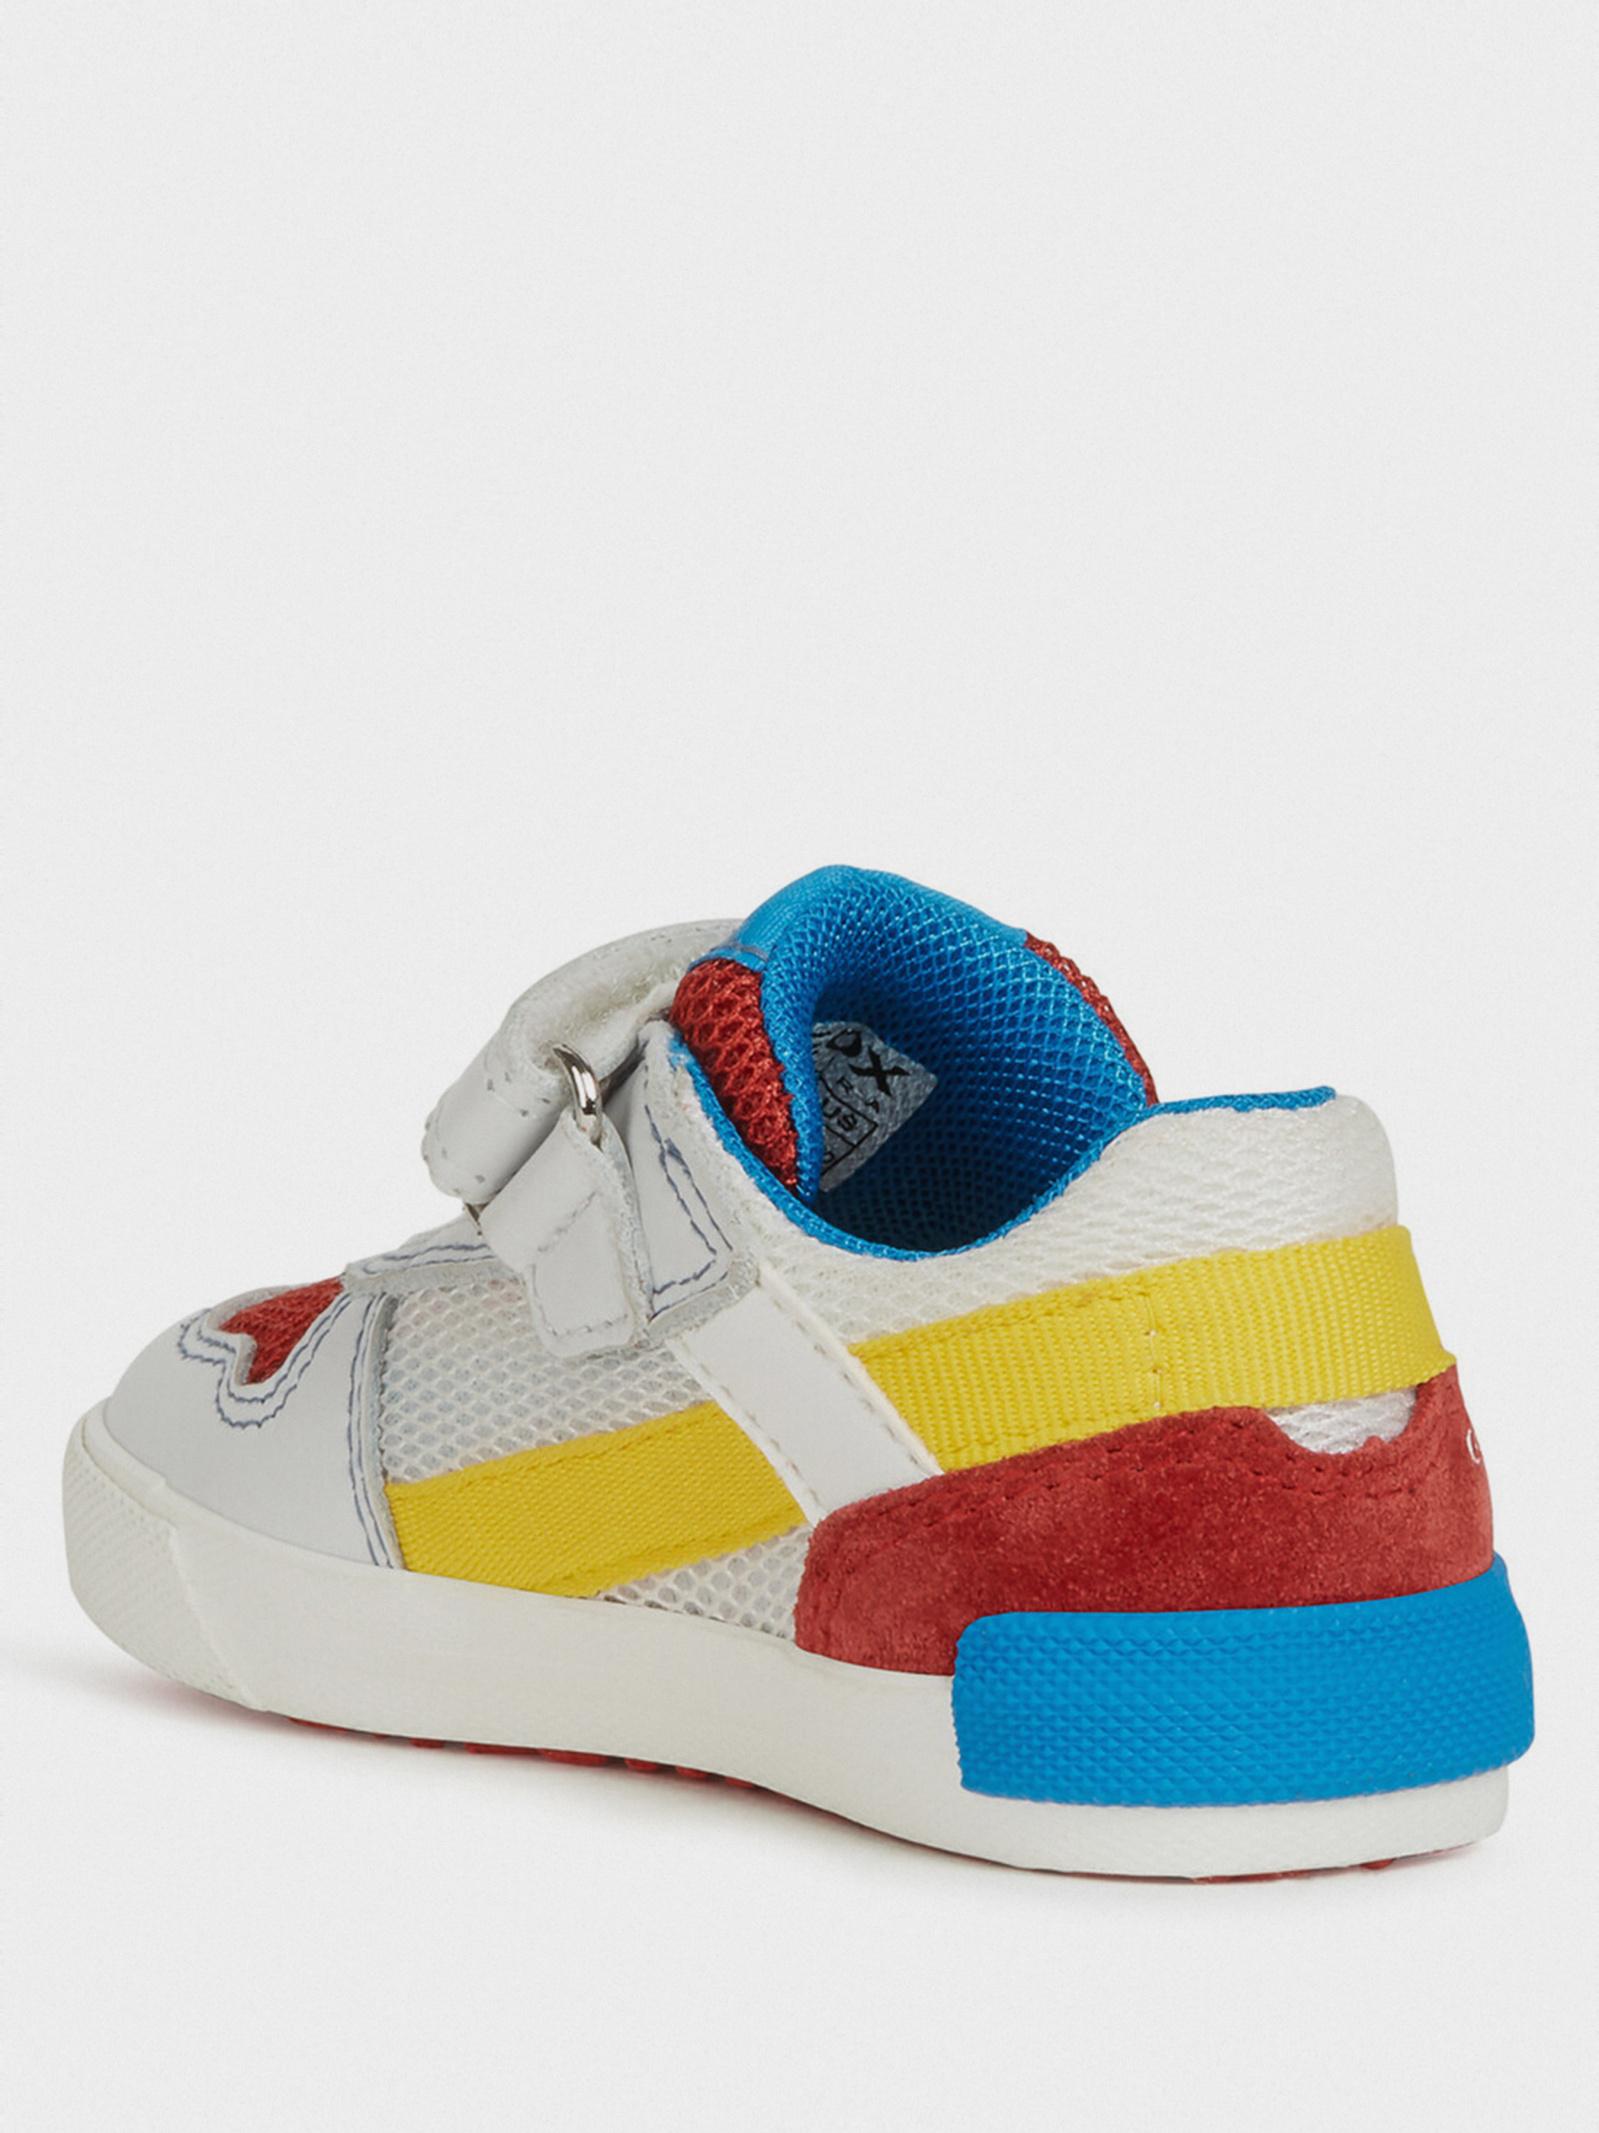 Полуботинки для детей Geox B KILWI BOY B02A7A-08514-C1026 размерная сетка обуви, 2017